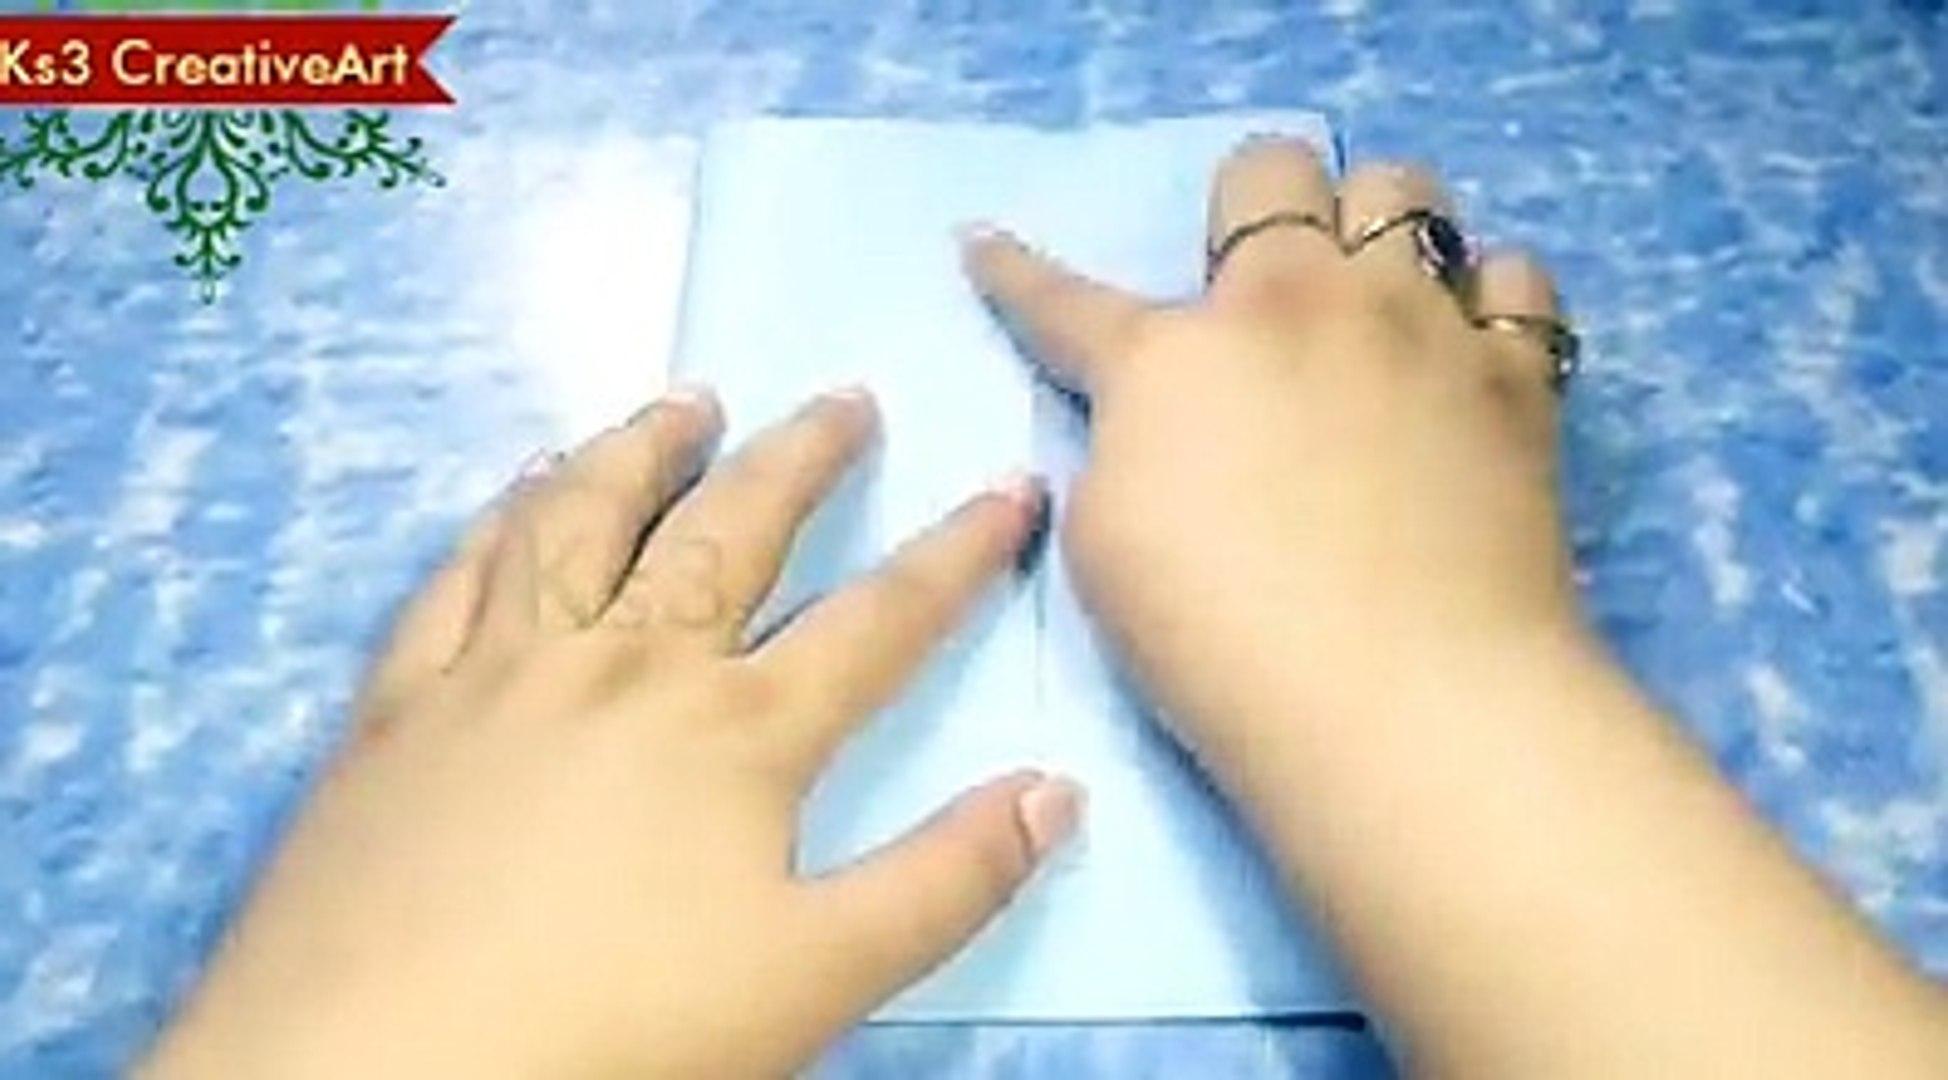 - DIY craft – How to make Easy Paper Gift bag craft idea | diy paper craftCredit: Ks3 CreativeArtFul